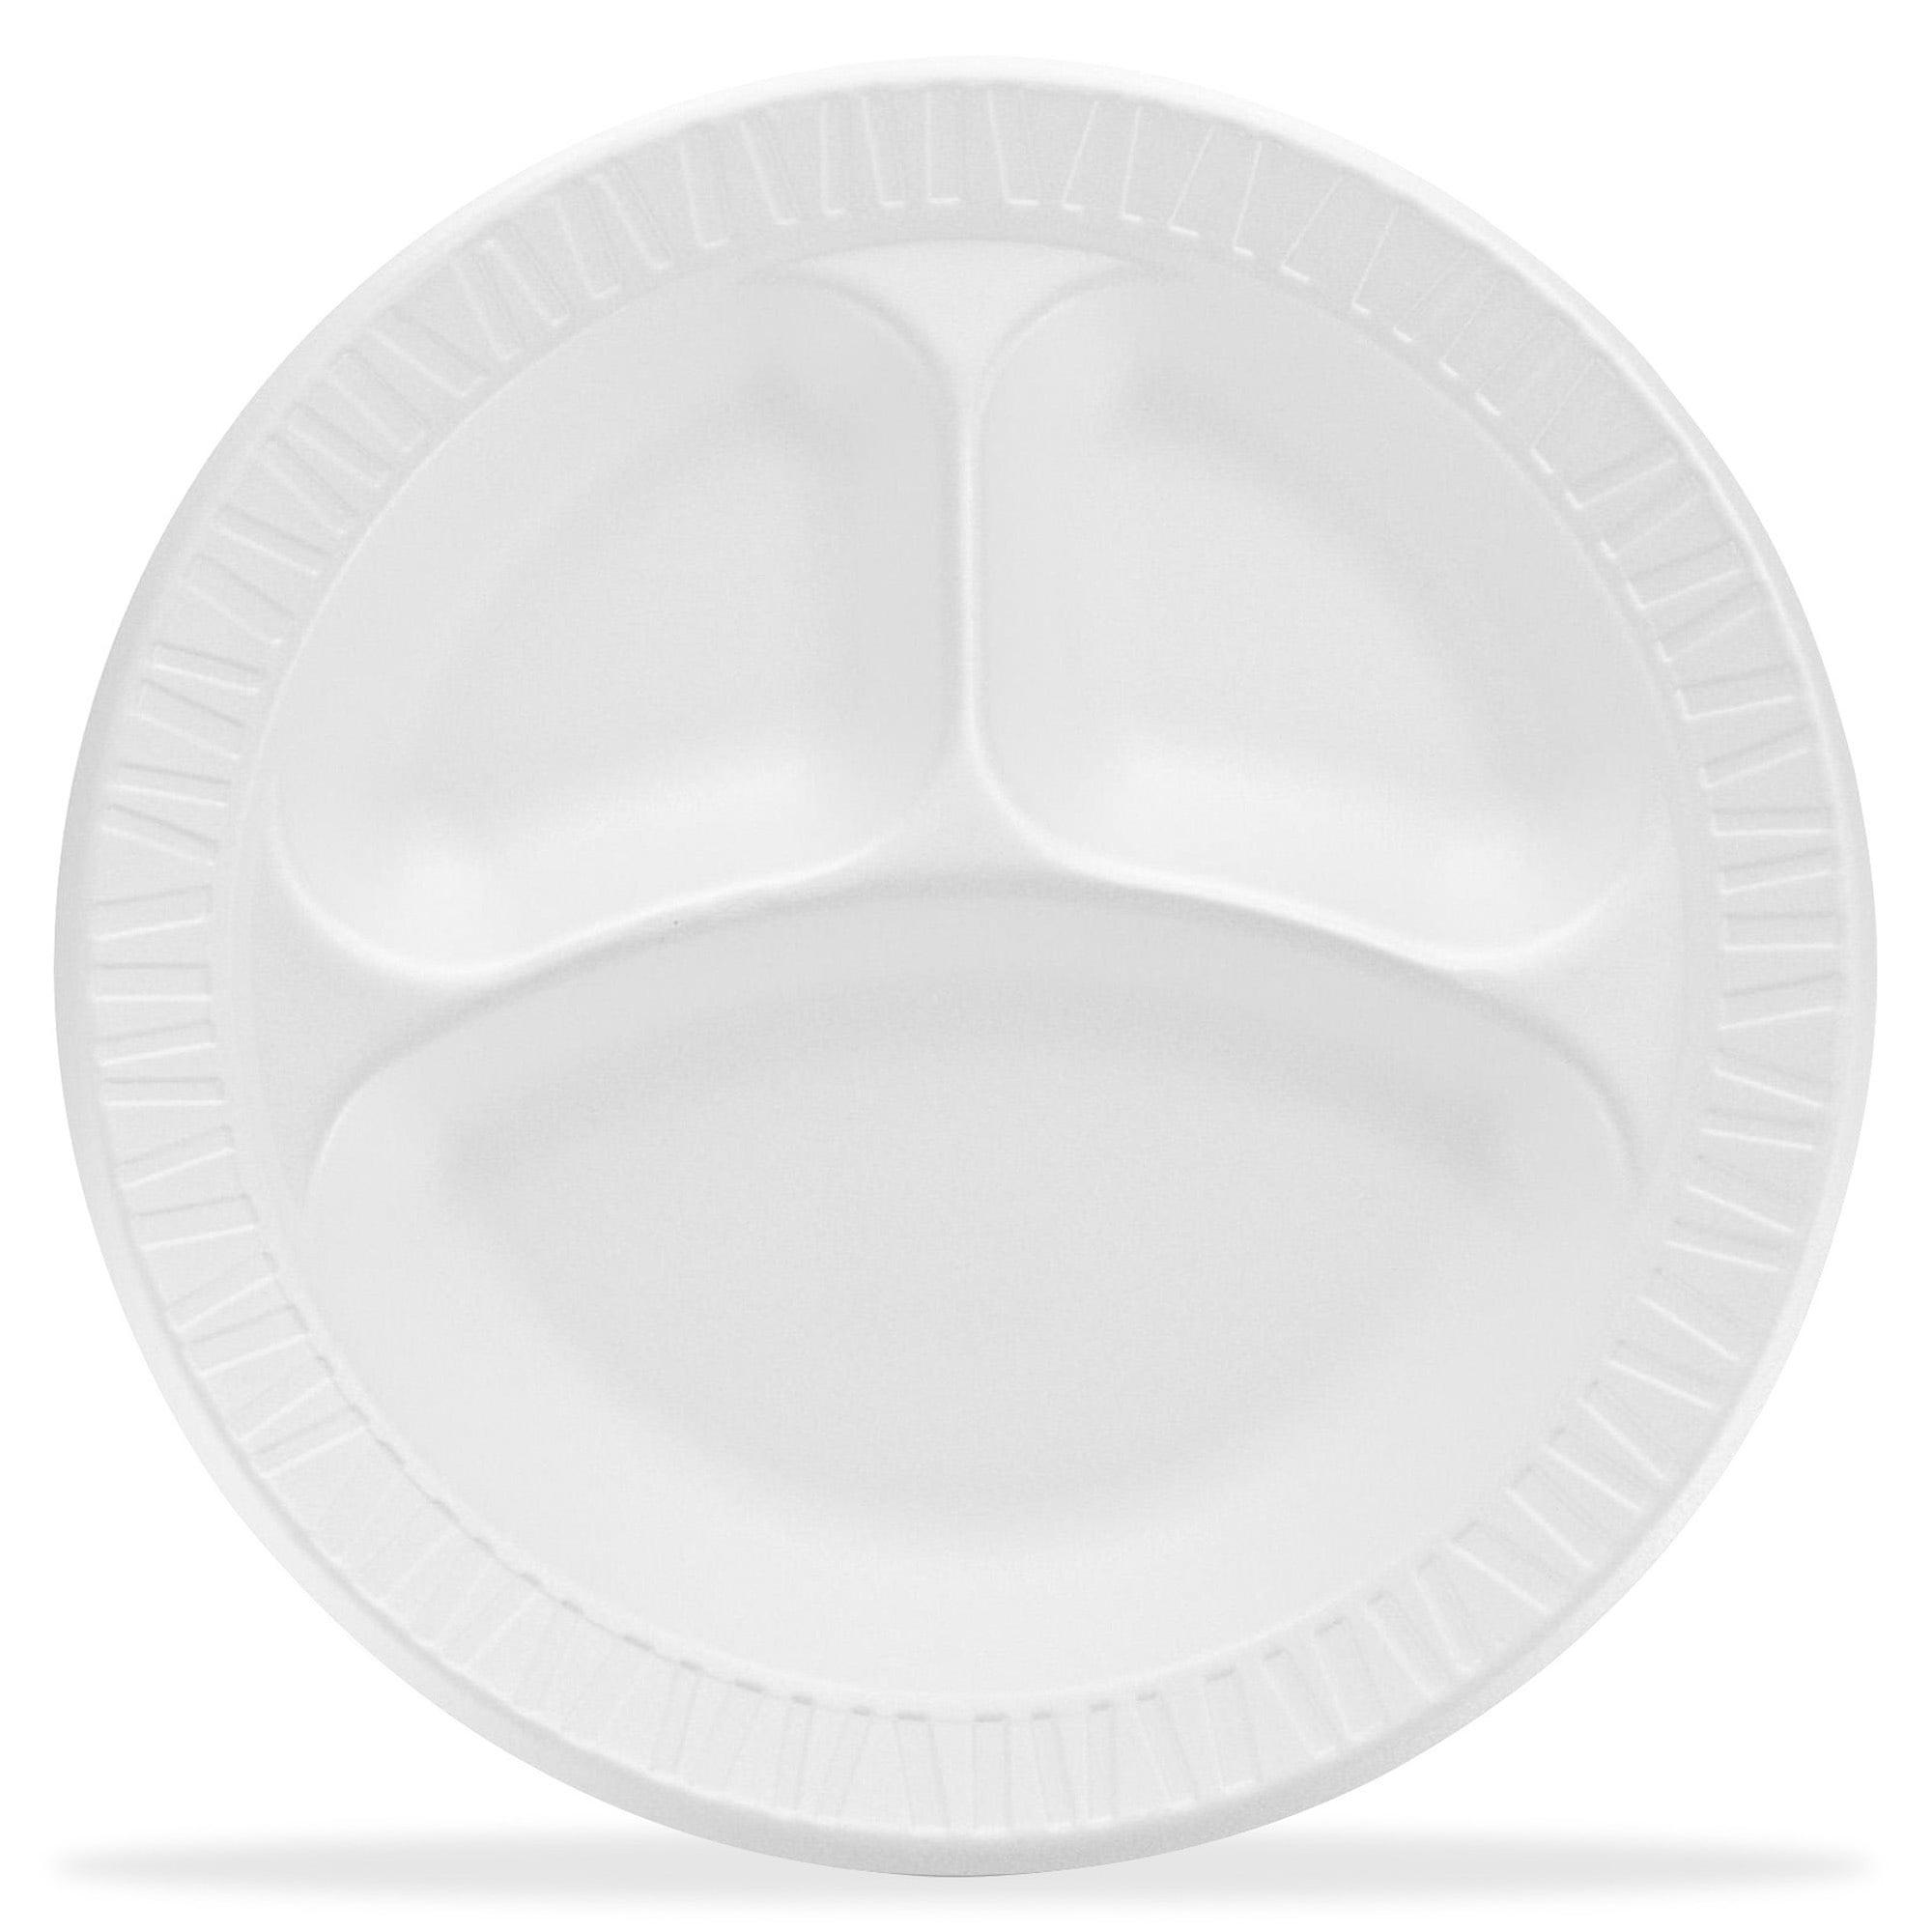 "Dart Compartment Foam Plates, 10.25"", 500 count"